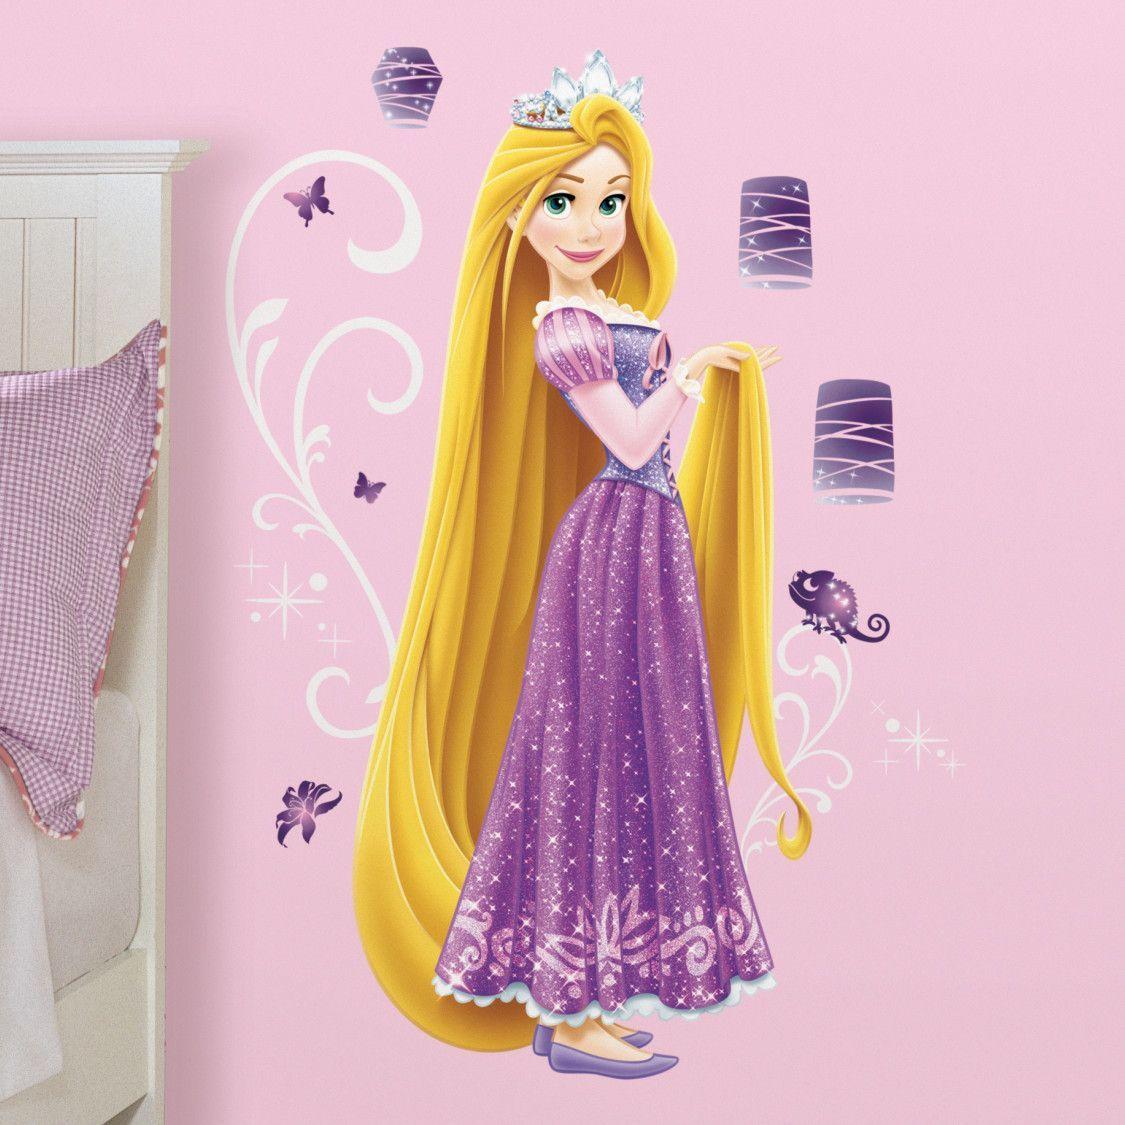 Disney Princess Rapunzel Giant Wall Decal Disney Princess Rapunzel